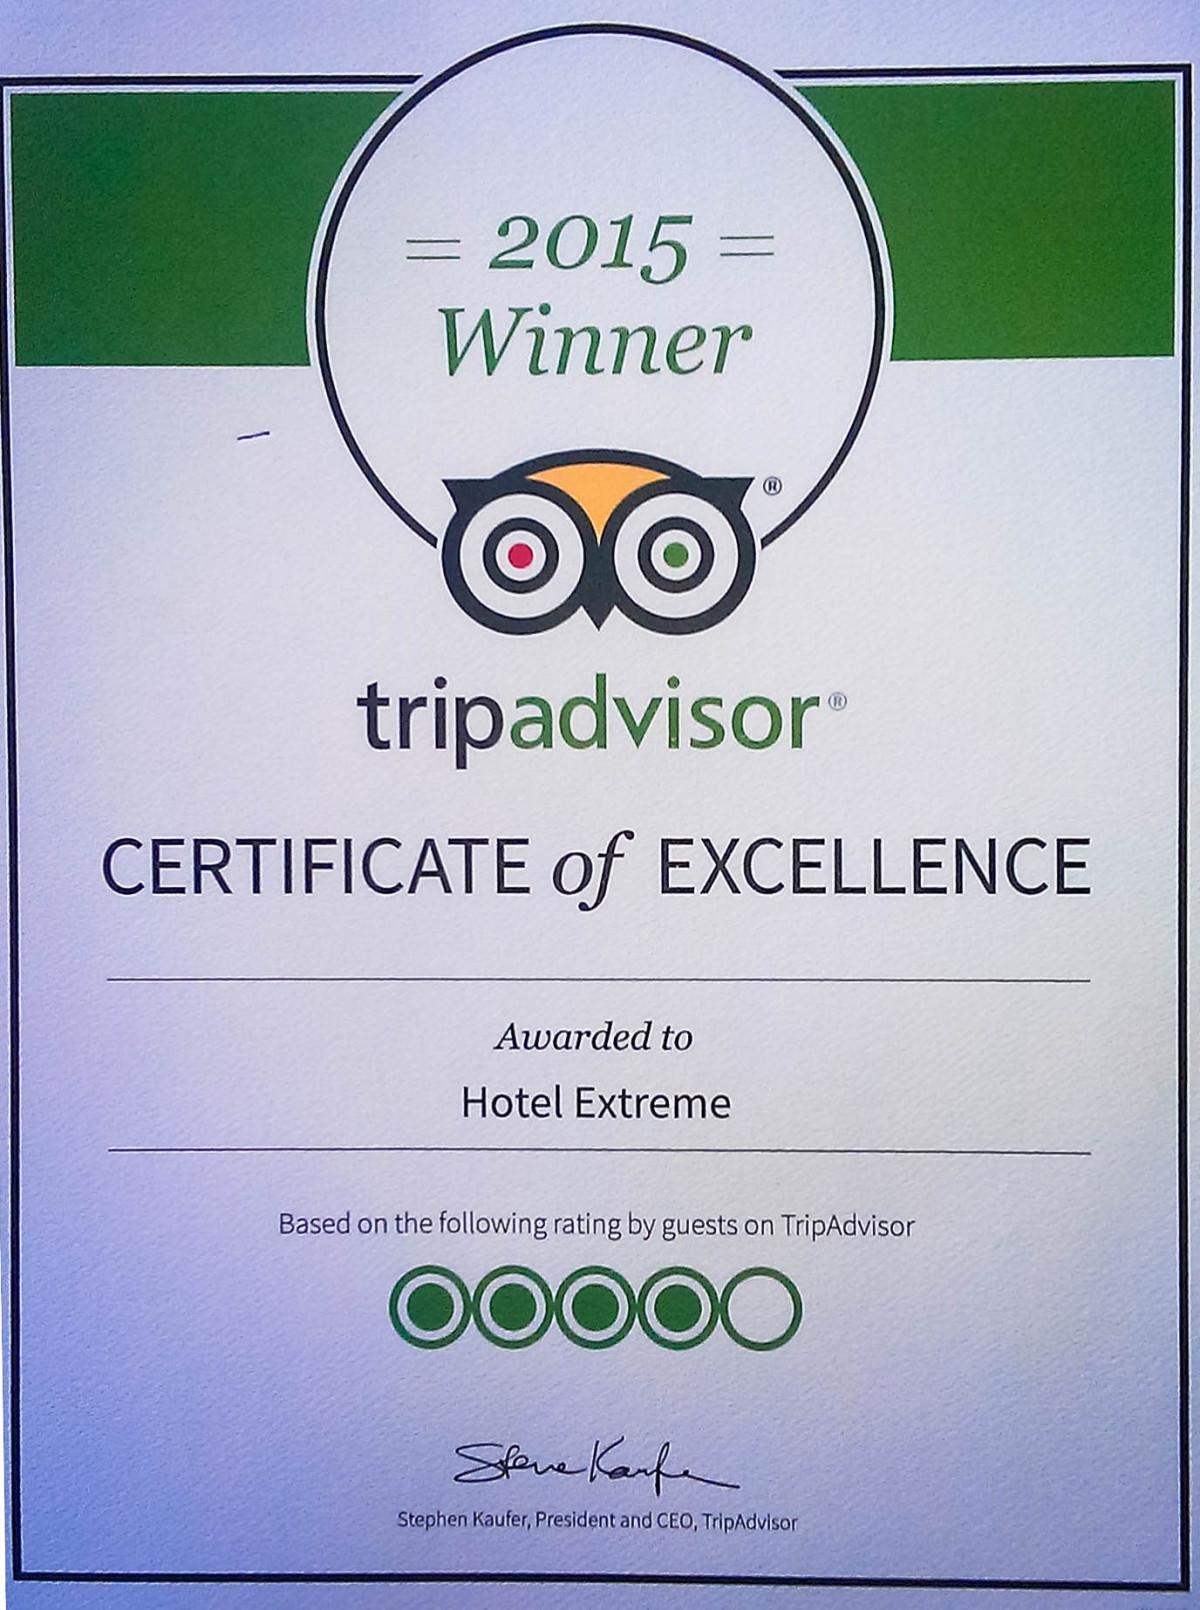 TripAdvisor certificate Хотел Екстрийм, Пампорово